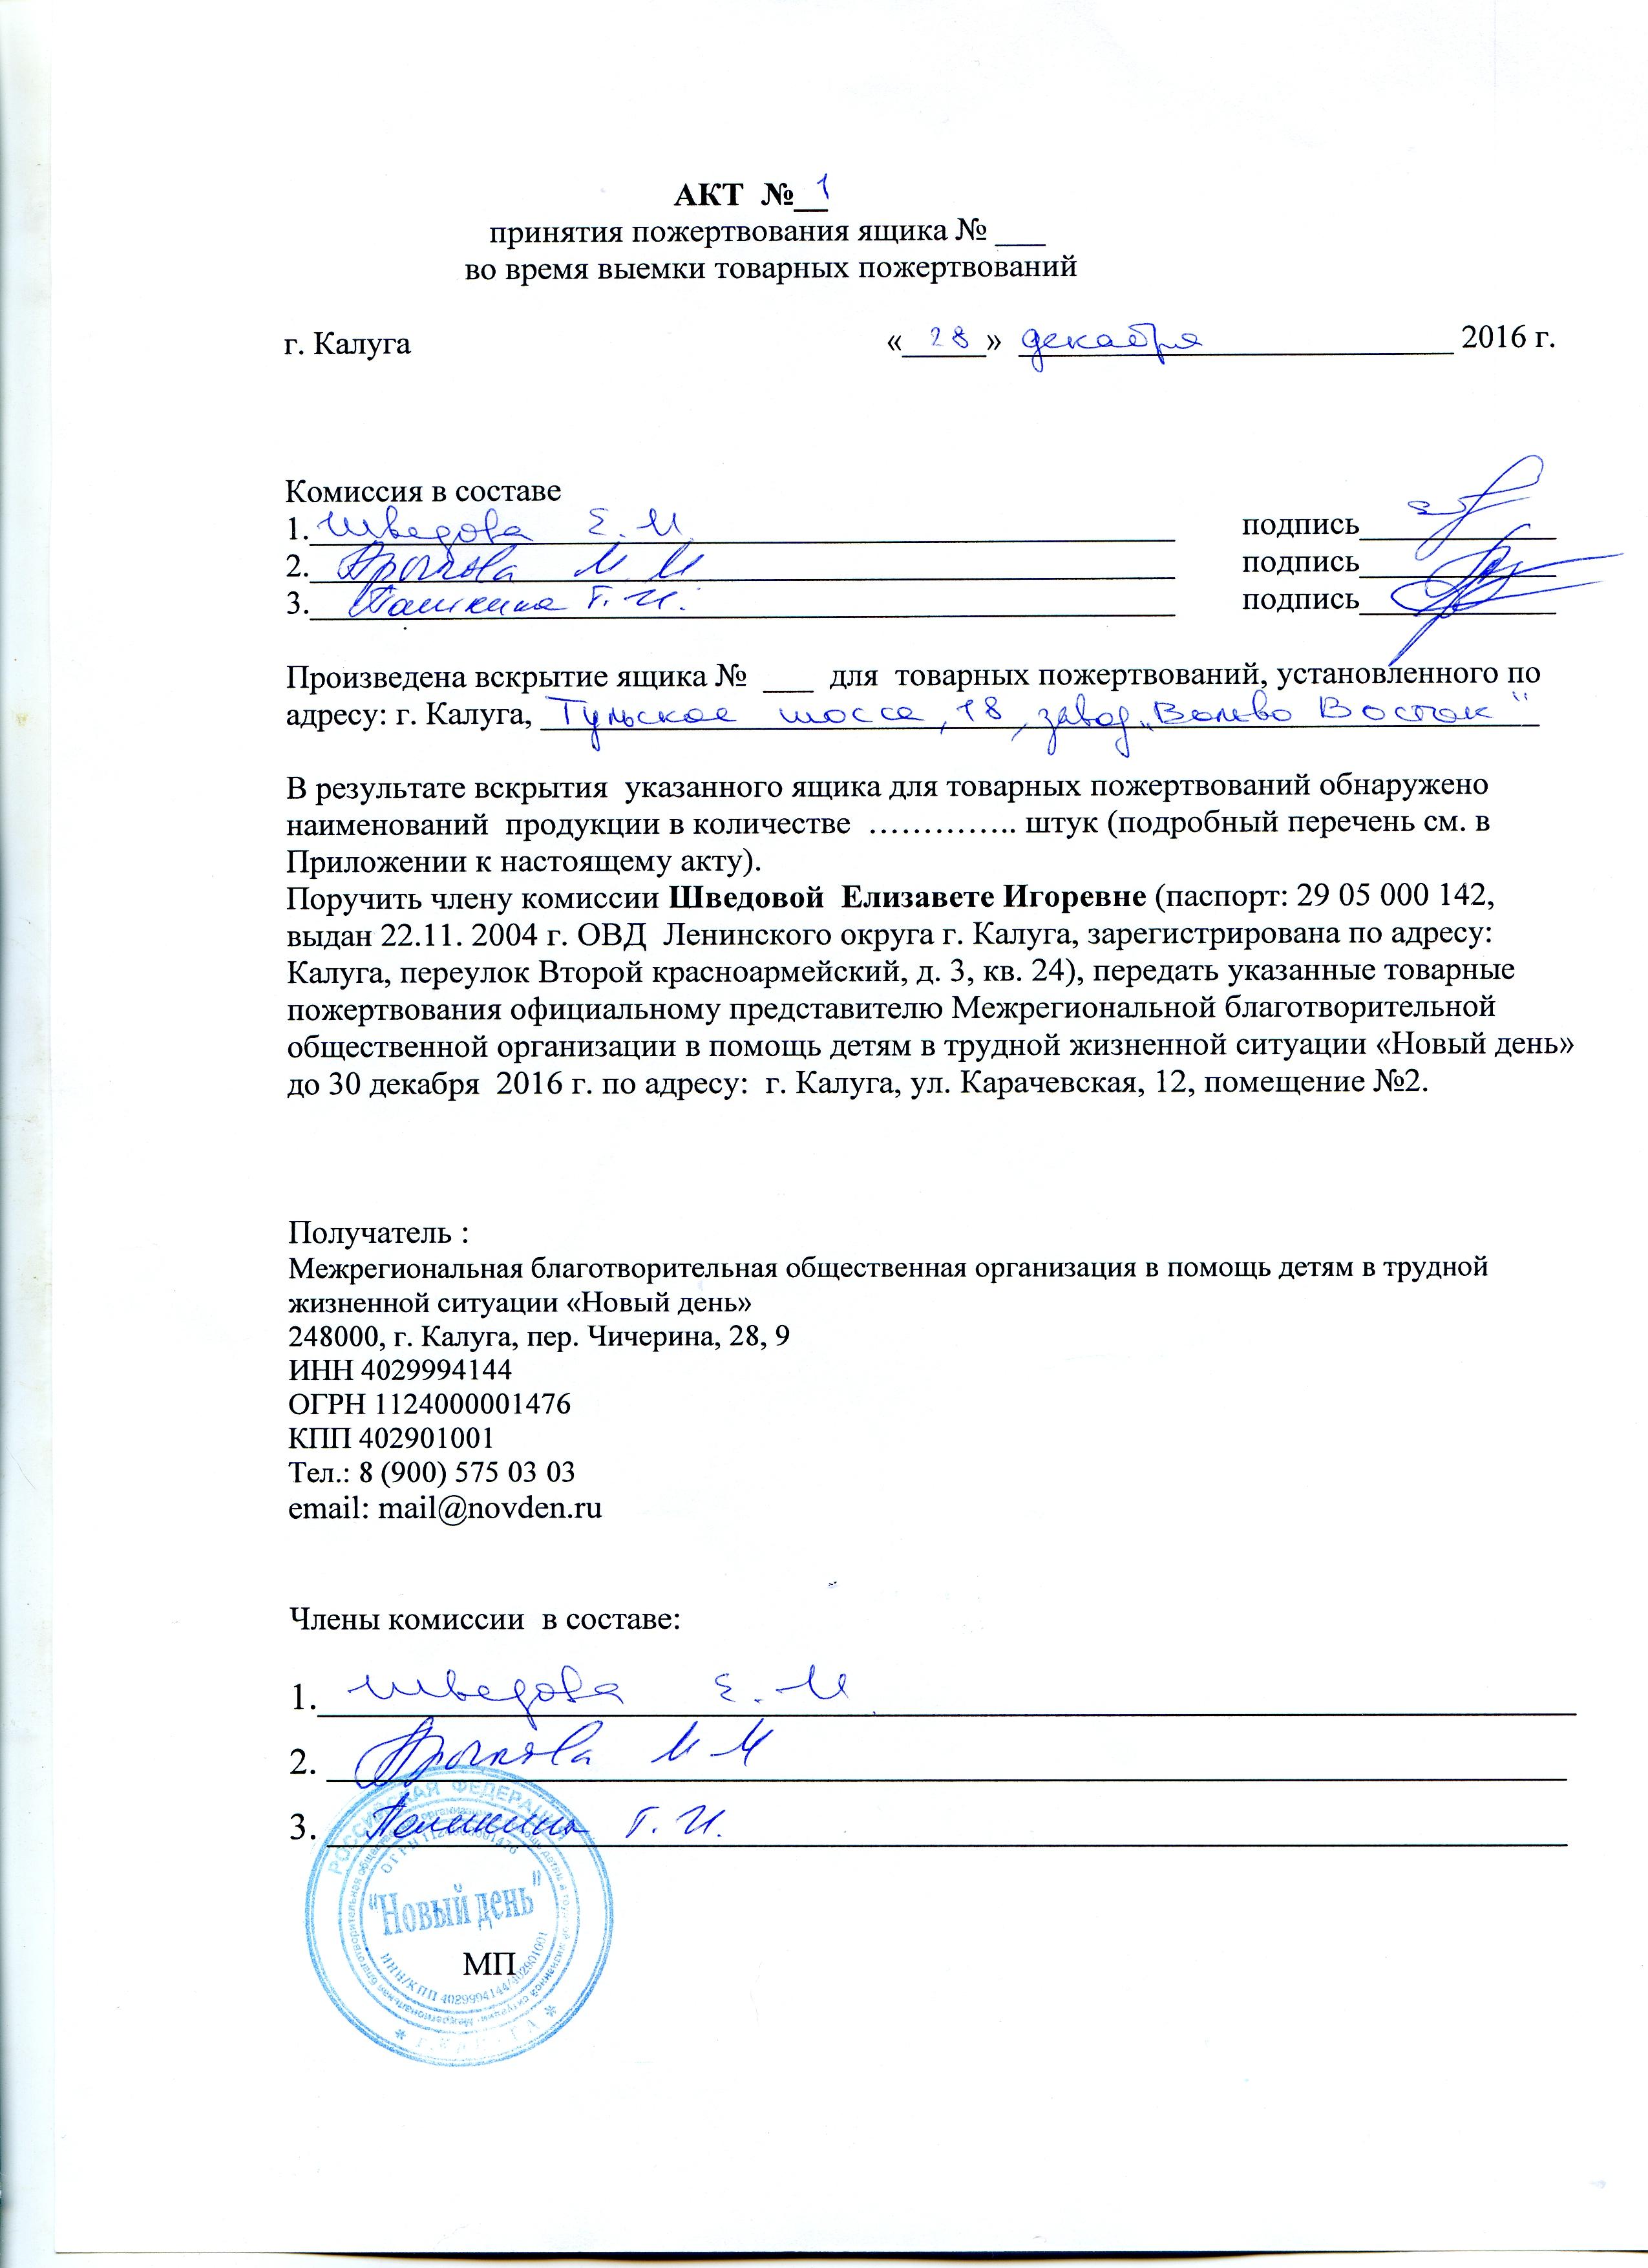 Акт 1 Кропоткина 28 декабря 2016298